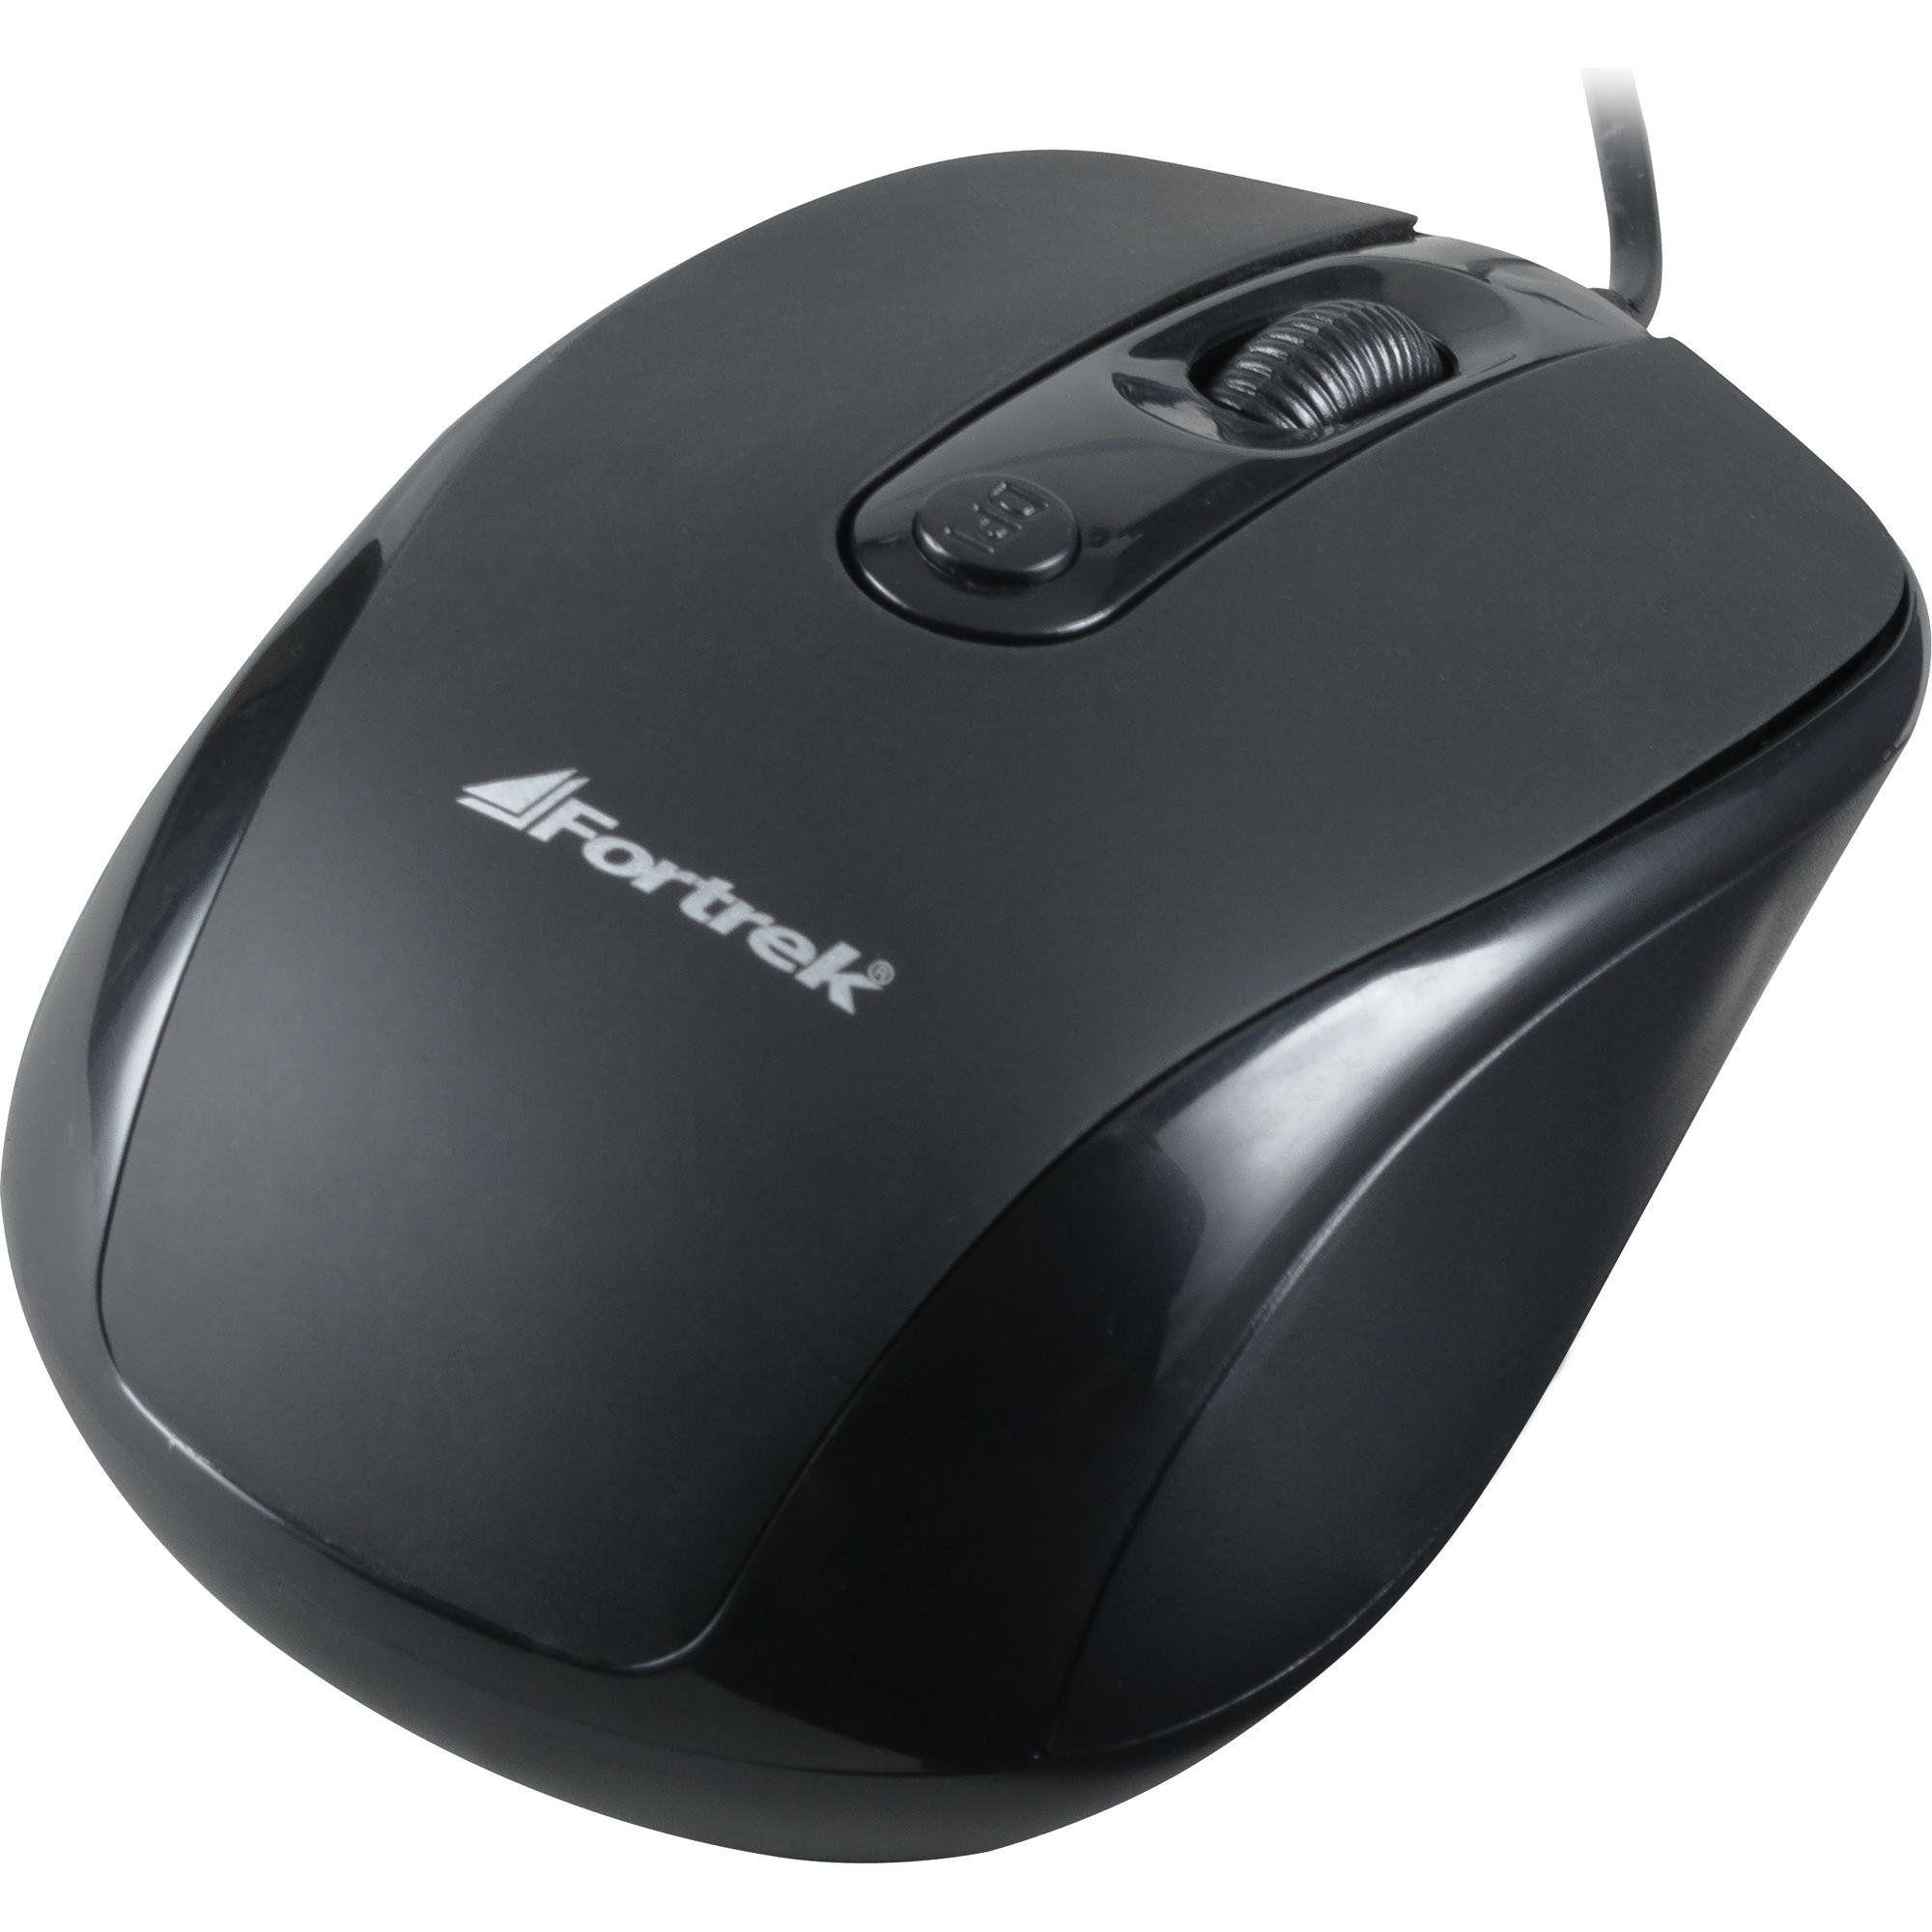 Mouse USB 1600DPI Preto Fortrek OM-103BK